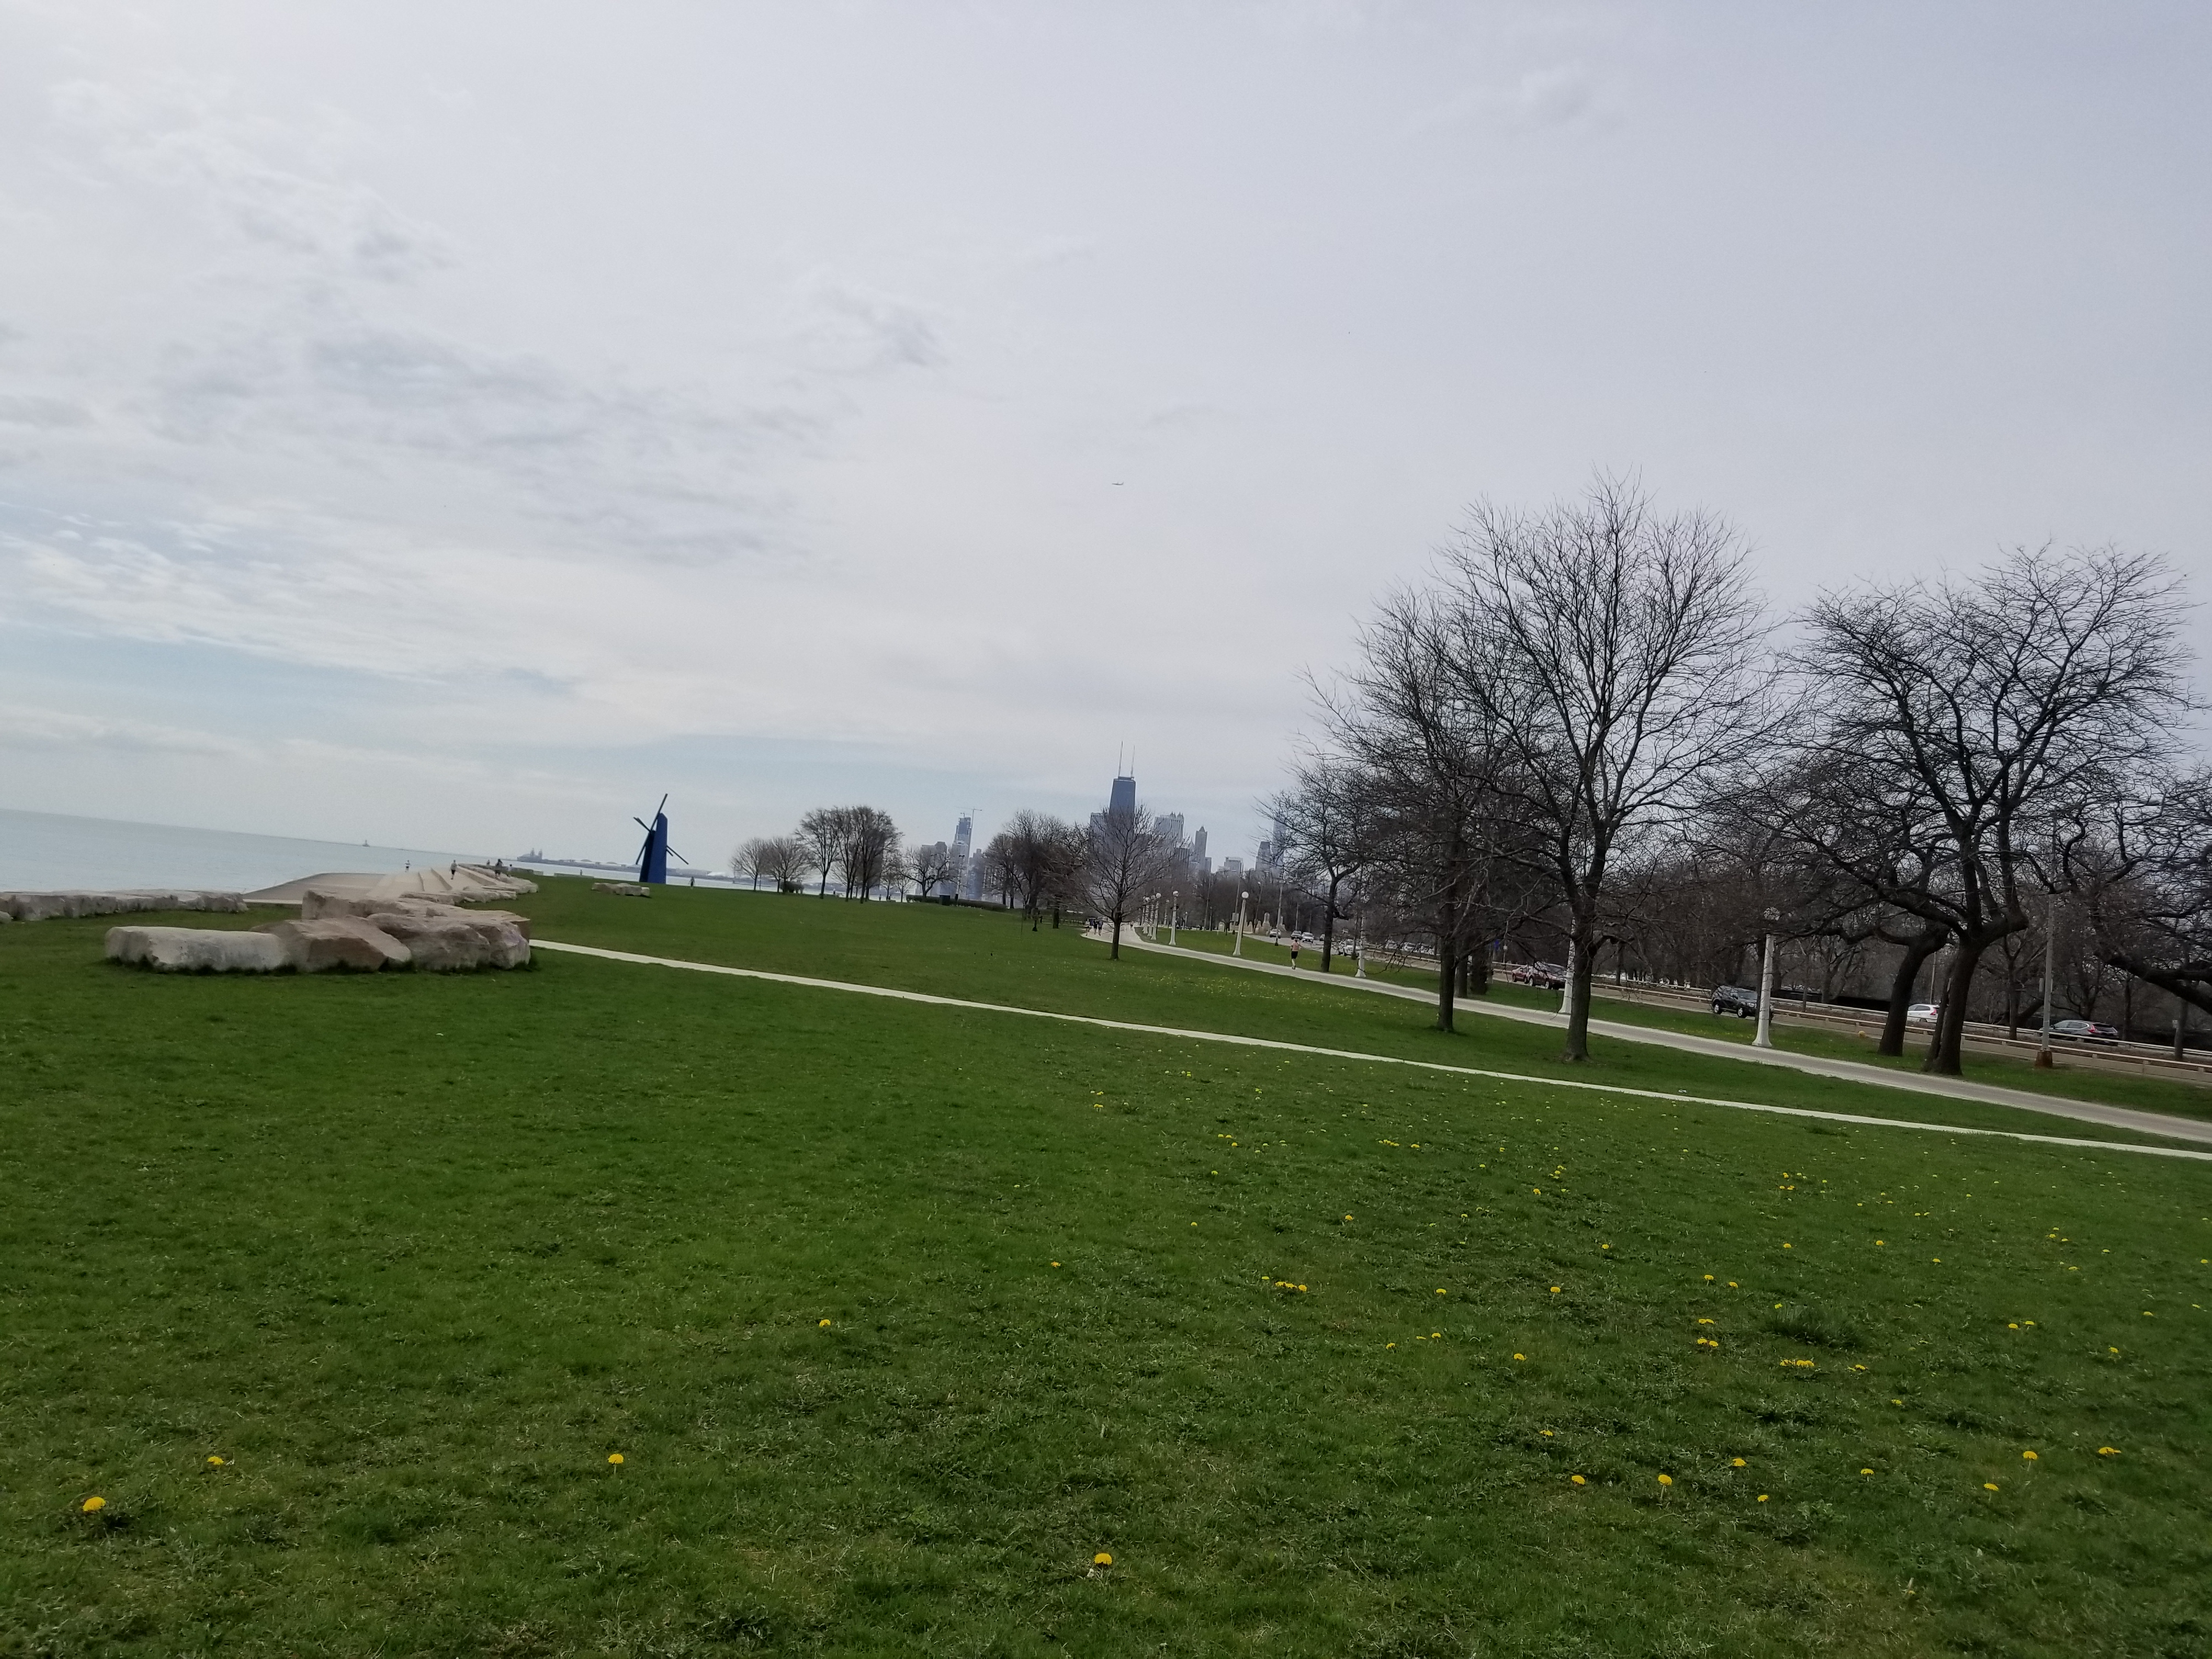 ChicagoTrip5-2018 (5)